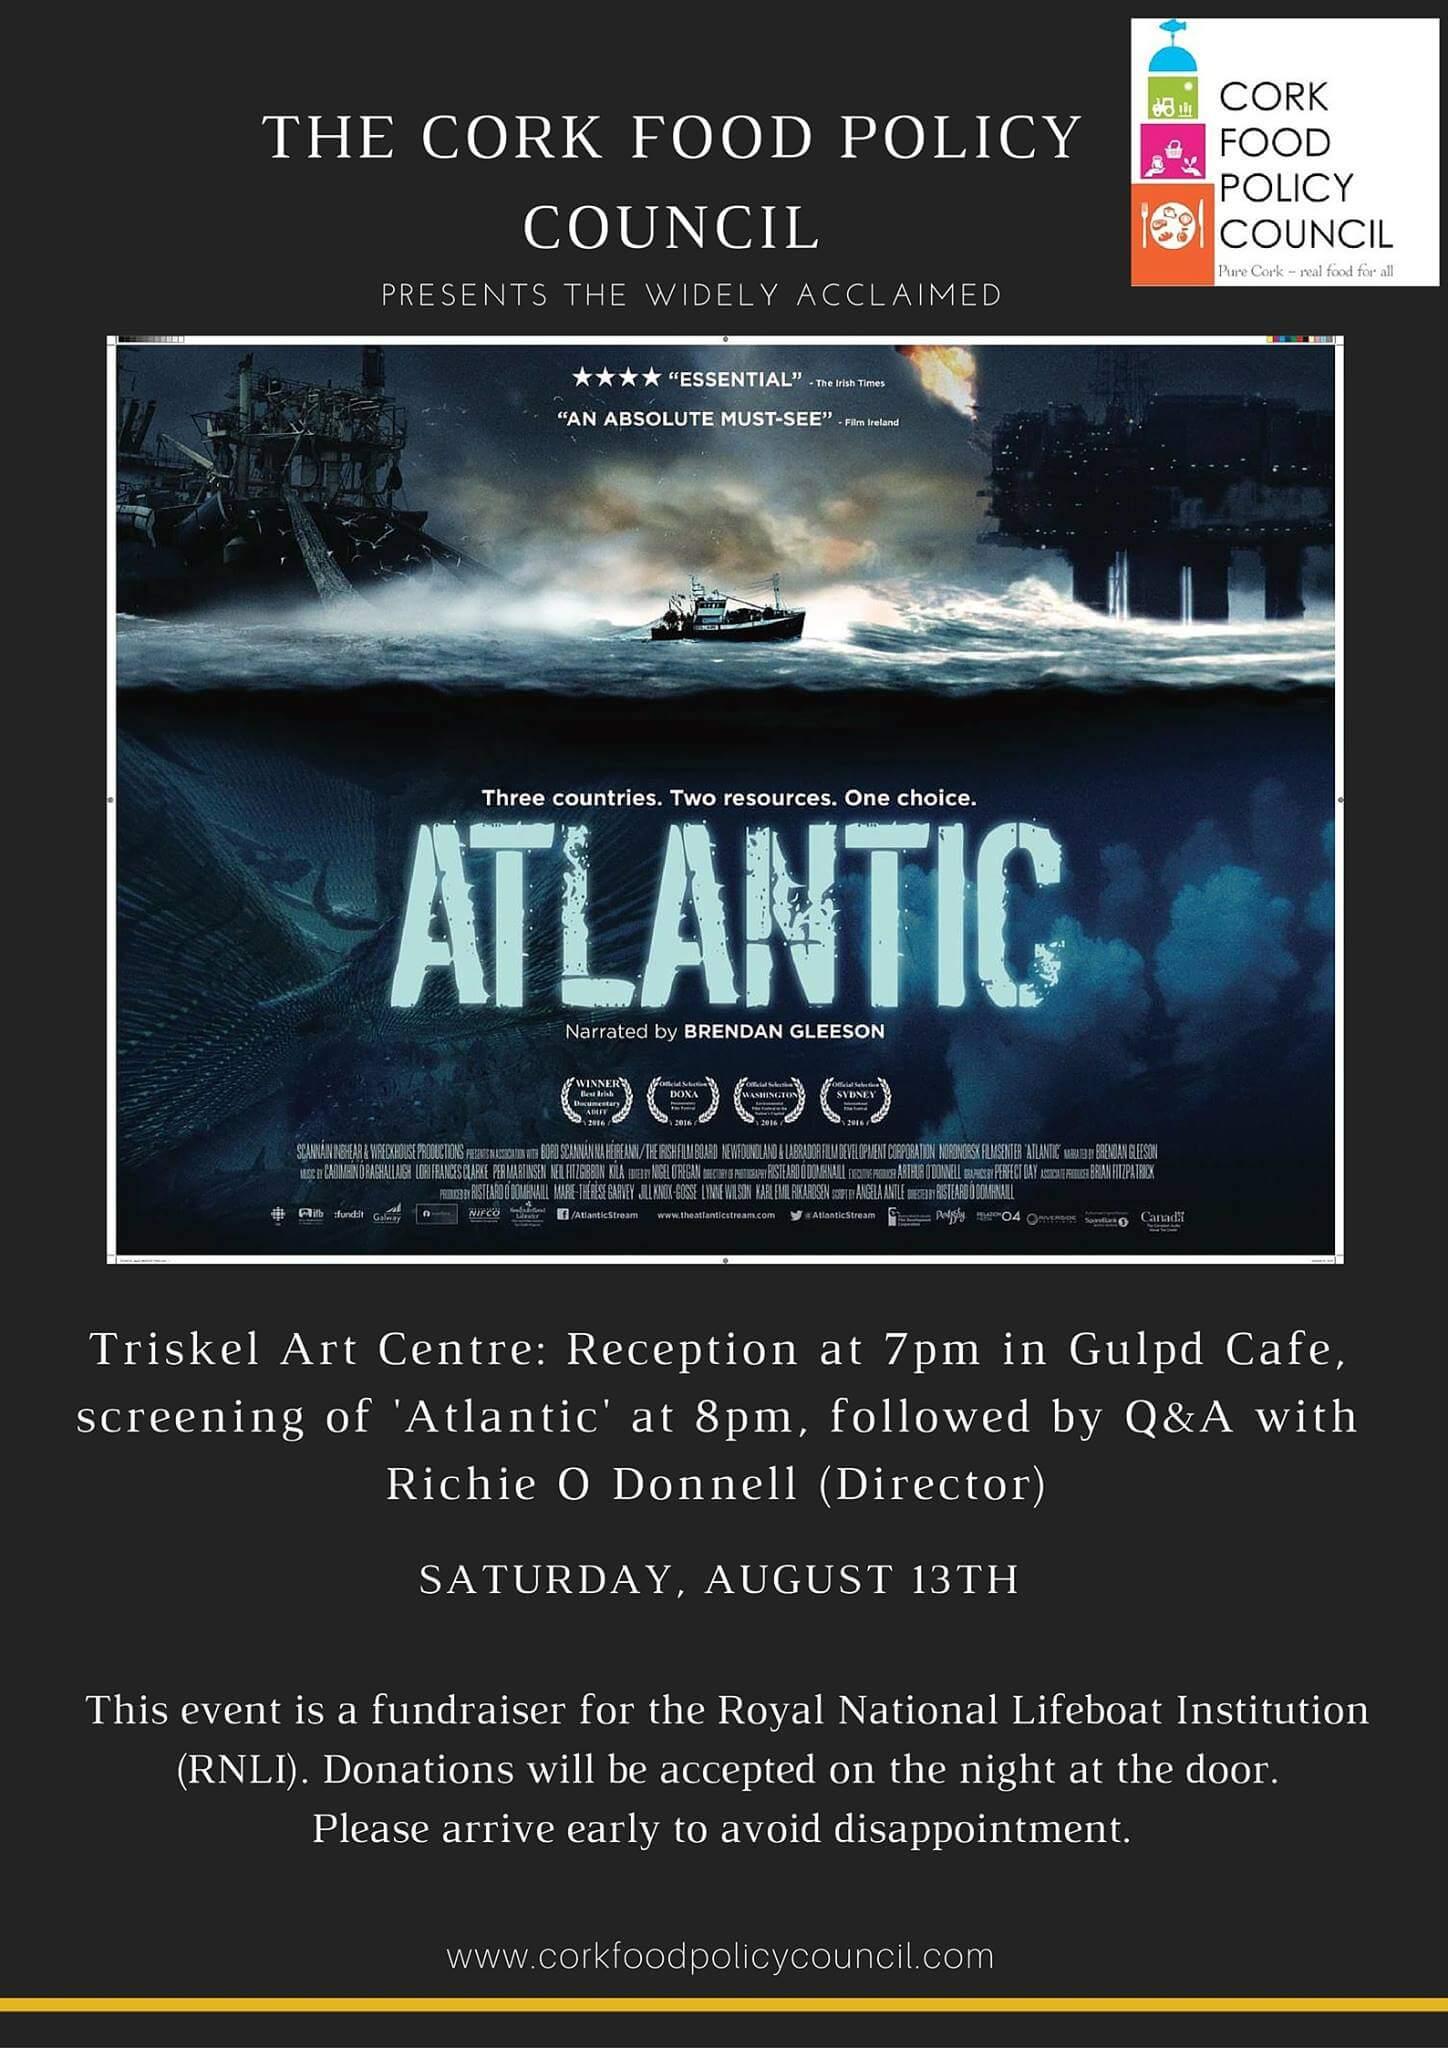 Atlantic_020816